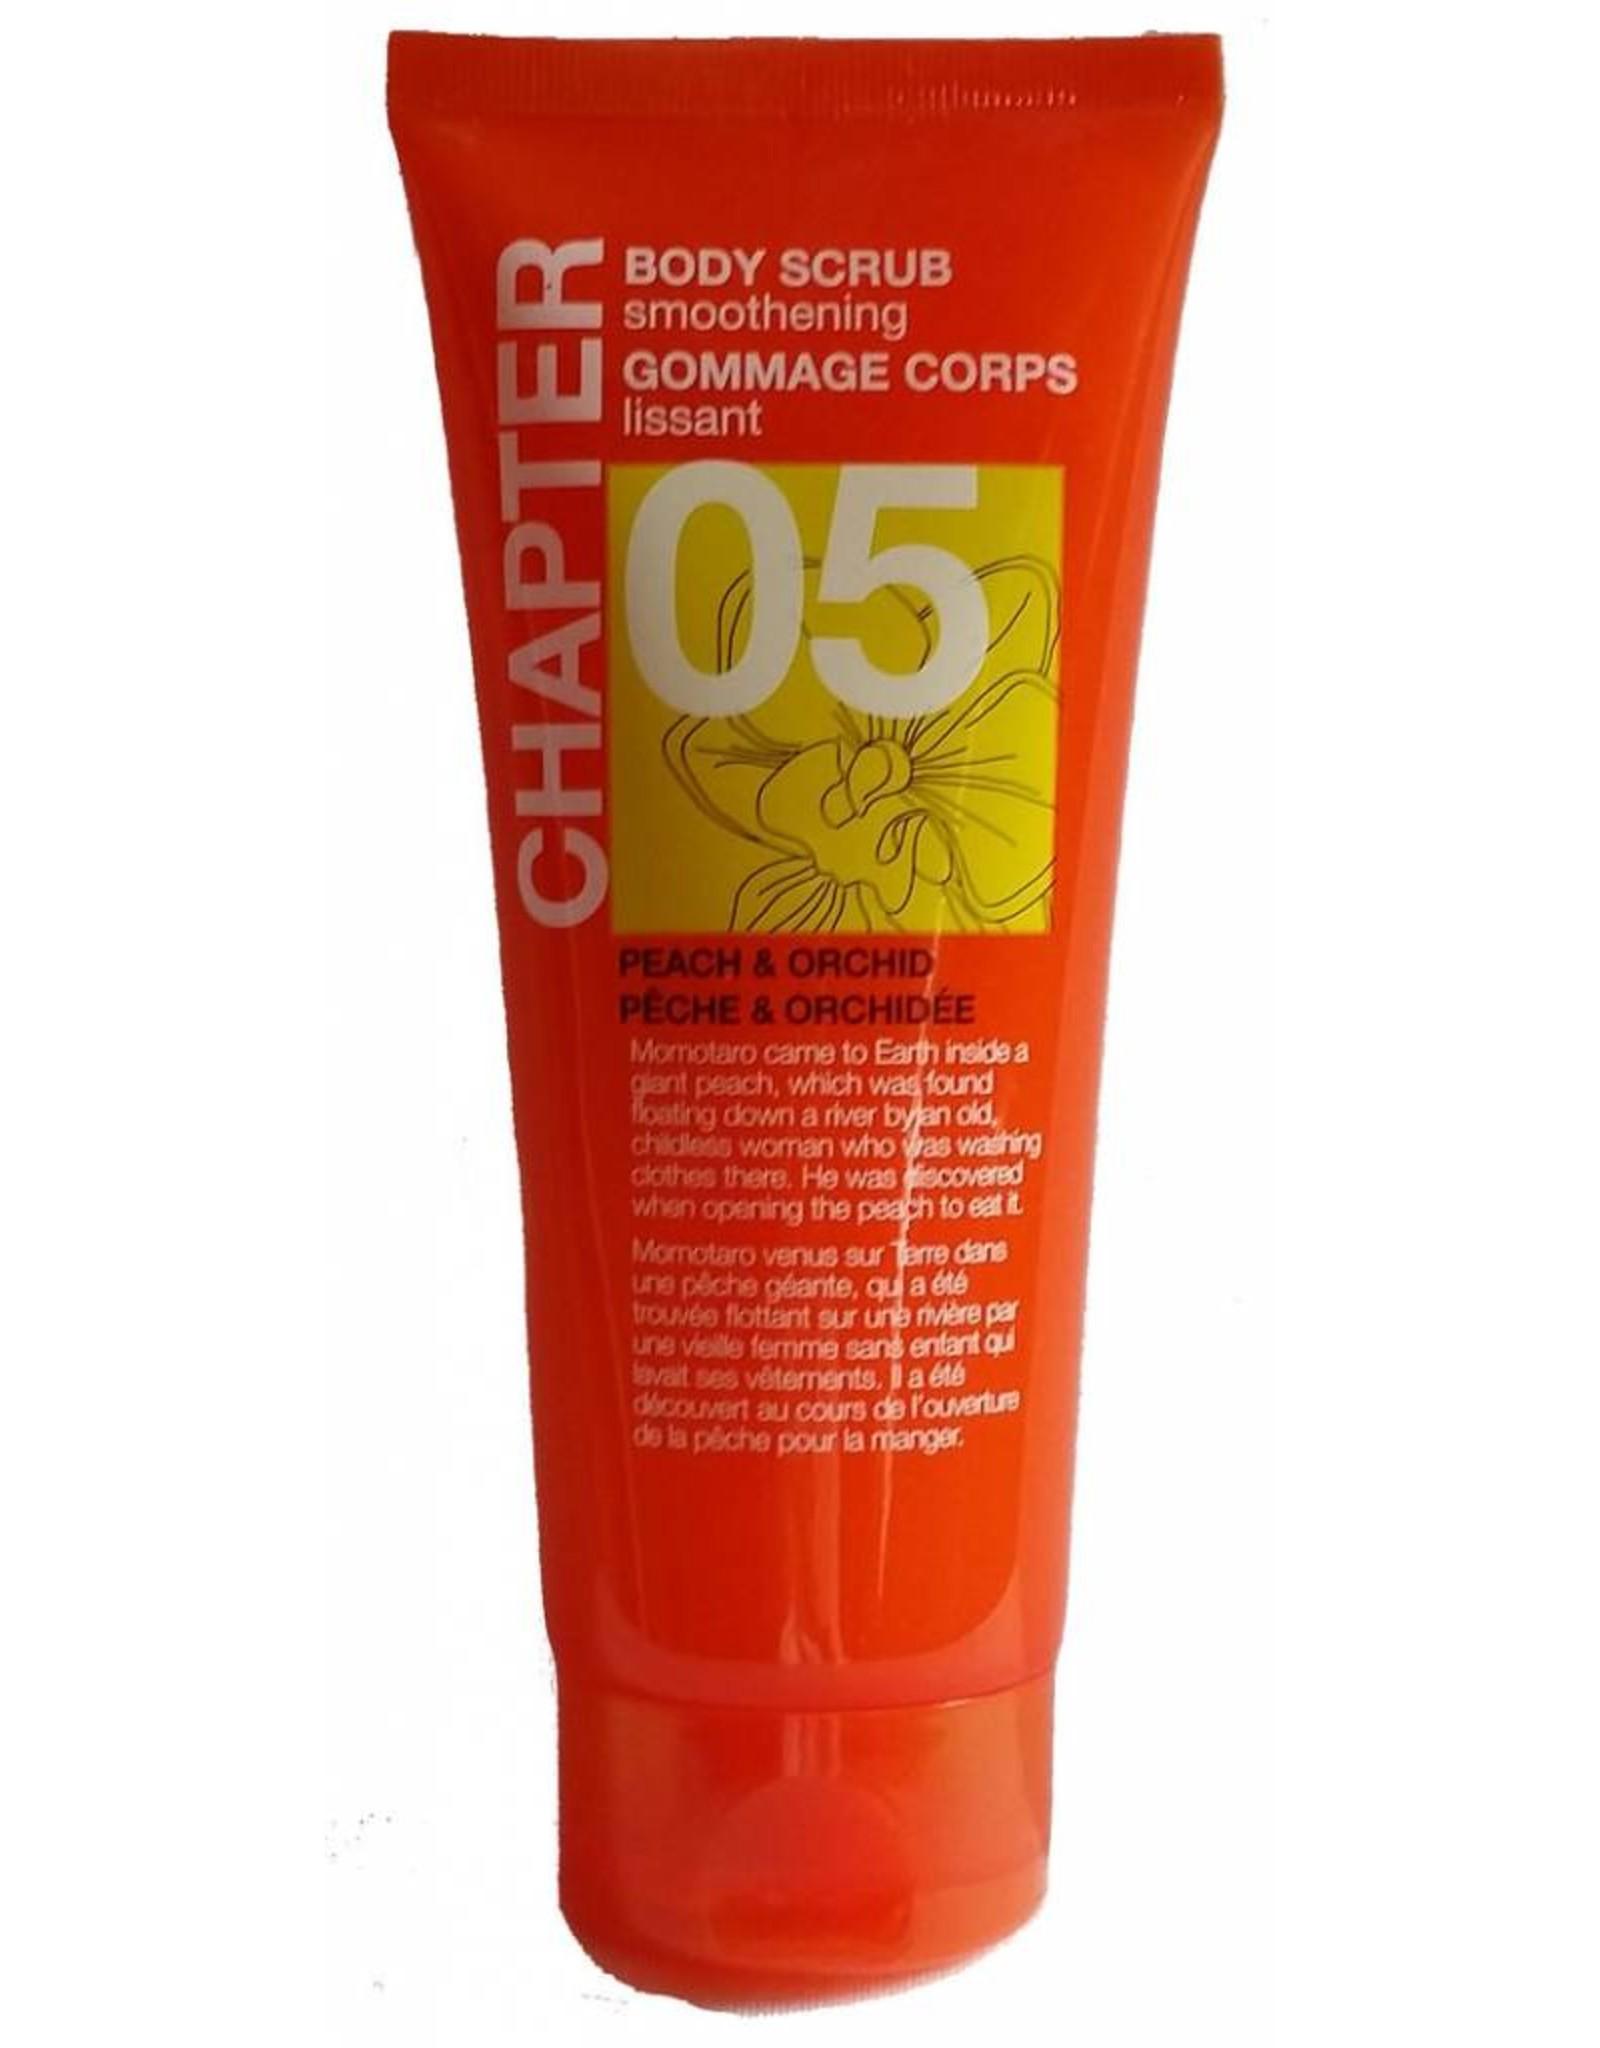 Body Scrub 'Chapter' - Body & Soap